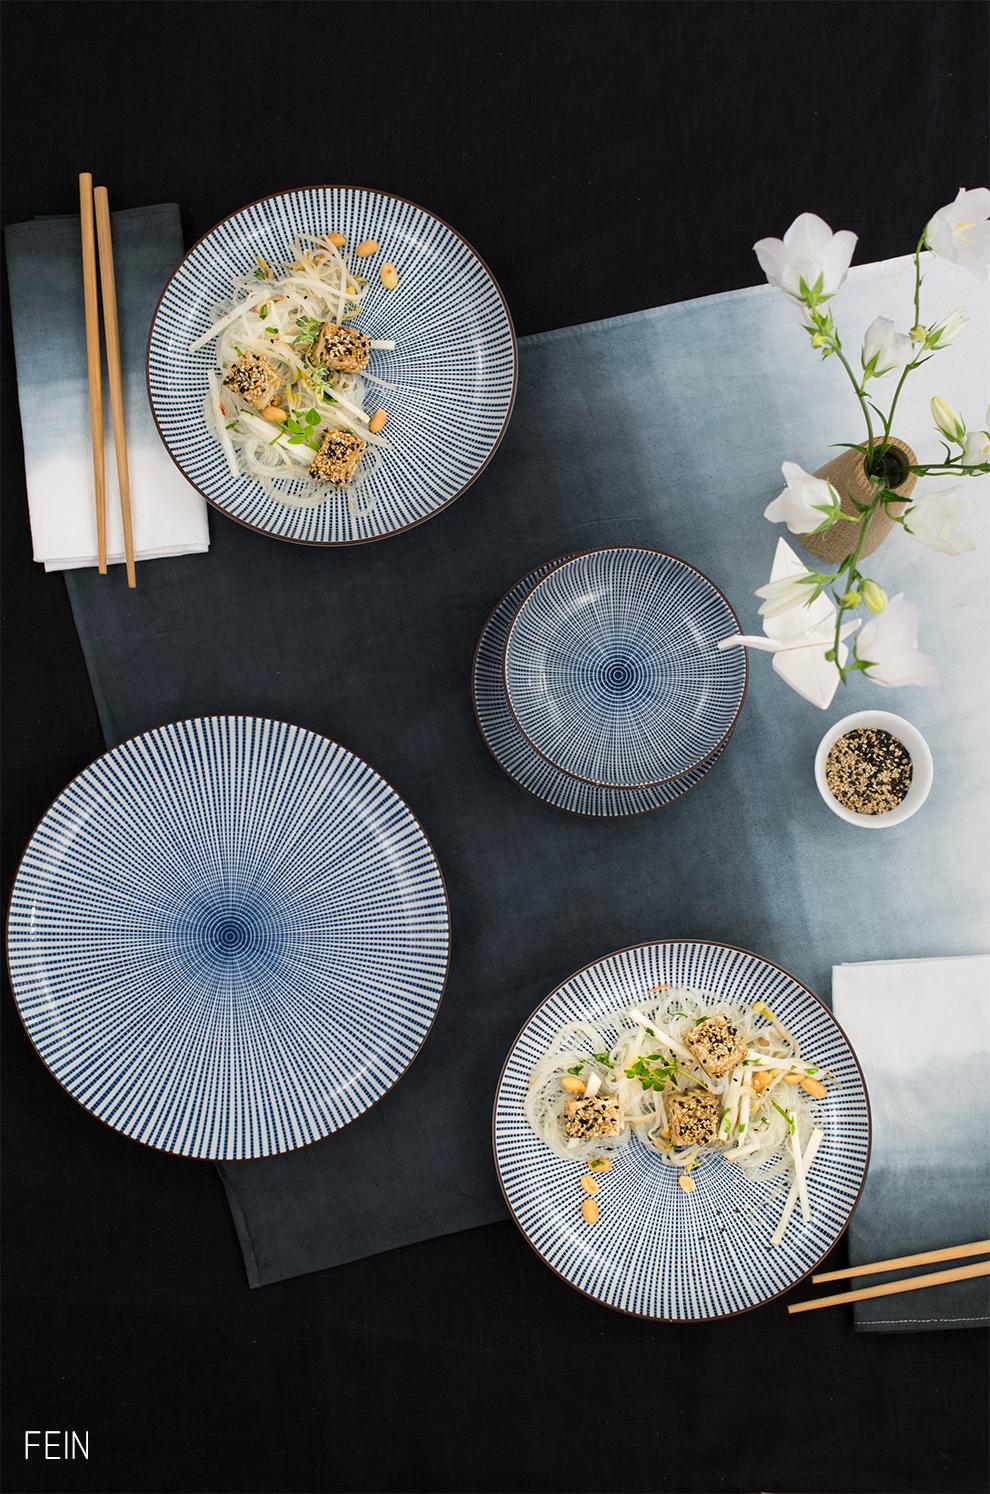 asia glasnudelsalat mit tofu im sesammantel. Black Bedroom Furniture Sets. Home Design Ideas